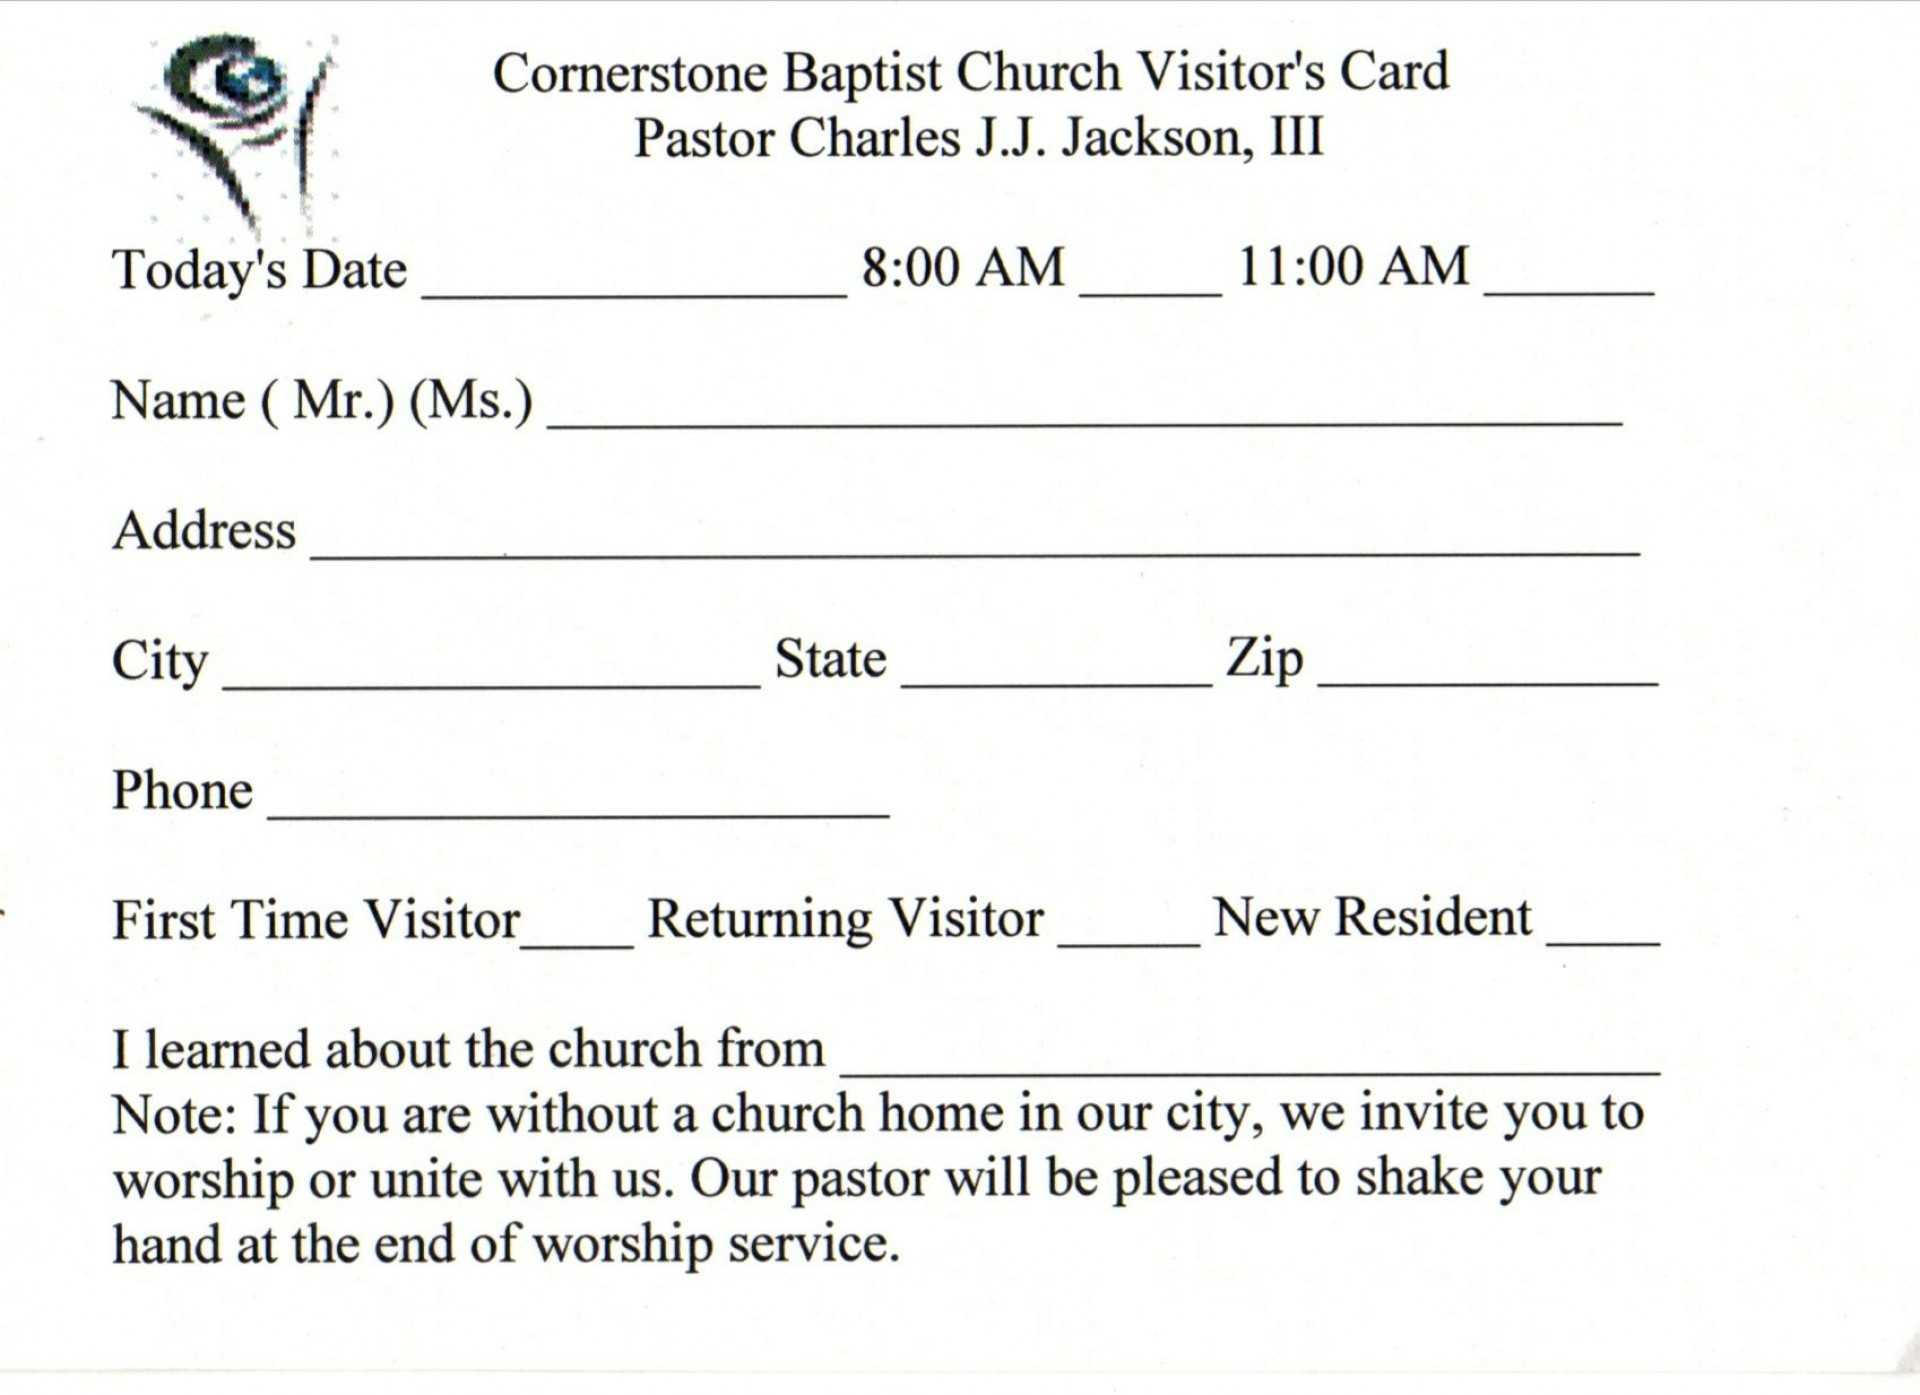 019 Template Ideas Church Visitor Card Word Impressive With Regard To Church Visitor Card Template Word